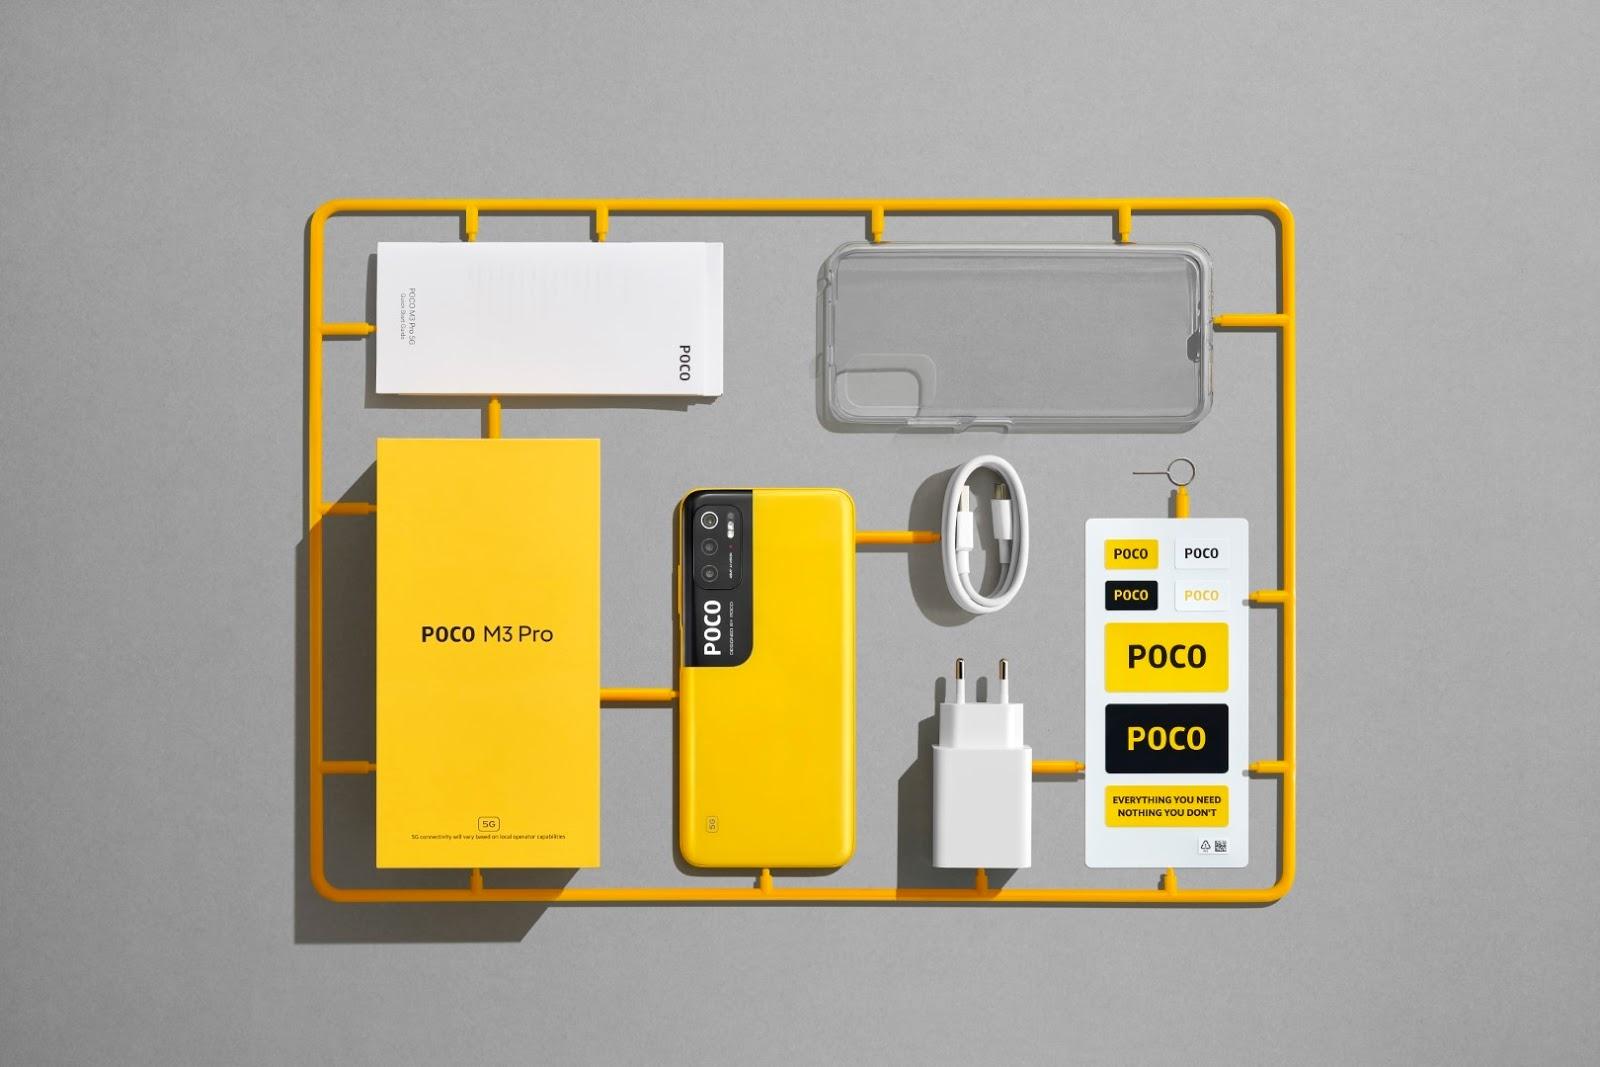 POCO เปิดตัว POCO M3 Pro 5G สมาร์ทโฟน 5G รุ่นใหม่ชูคอนเซ็ปต์ More Speed, More Everything พร้อมมอบประสบการณ์ความบันเทิงขั้นสุด